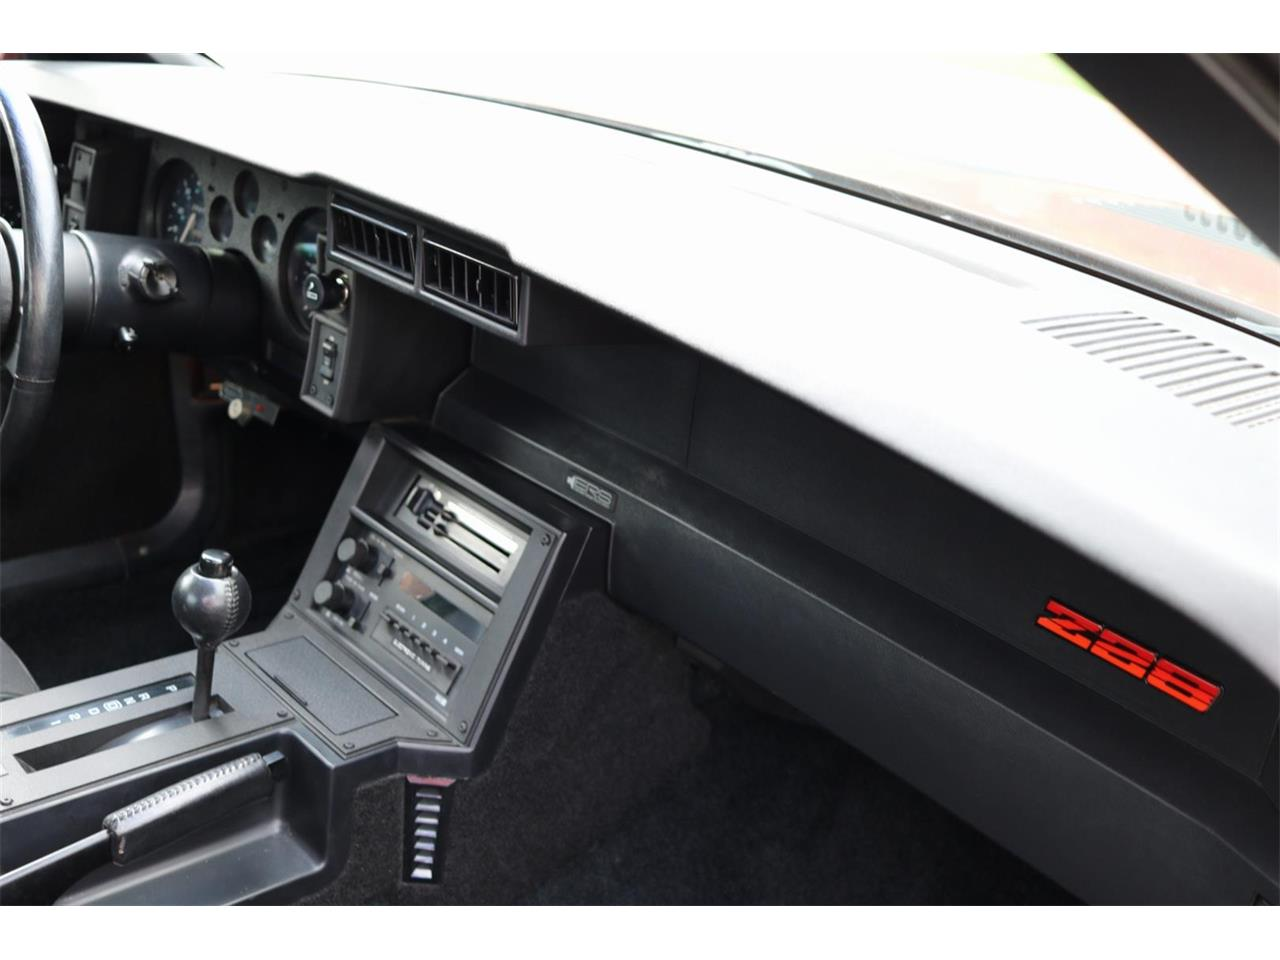 1986 Chevrolet Camaro Z28 (CC-1203605) for sale in Conroe, Texas